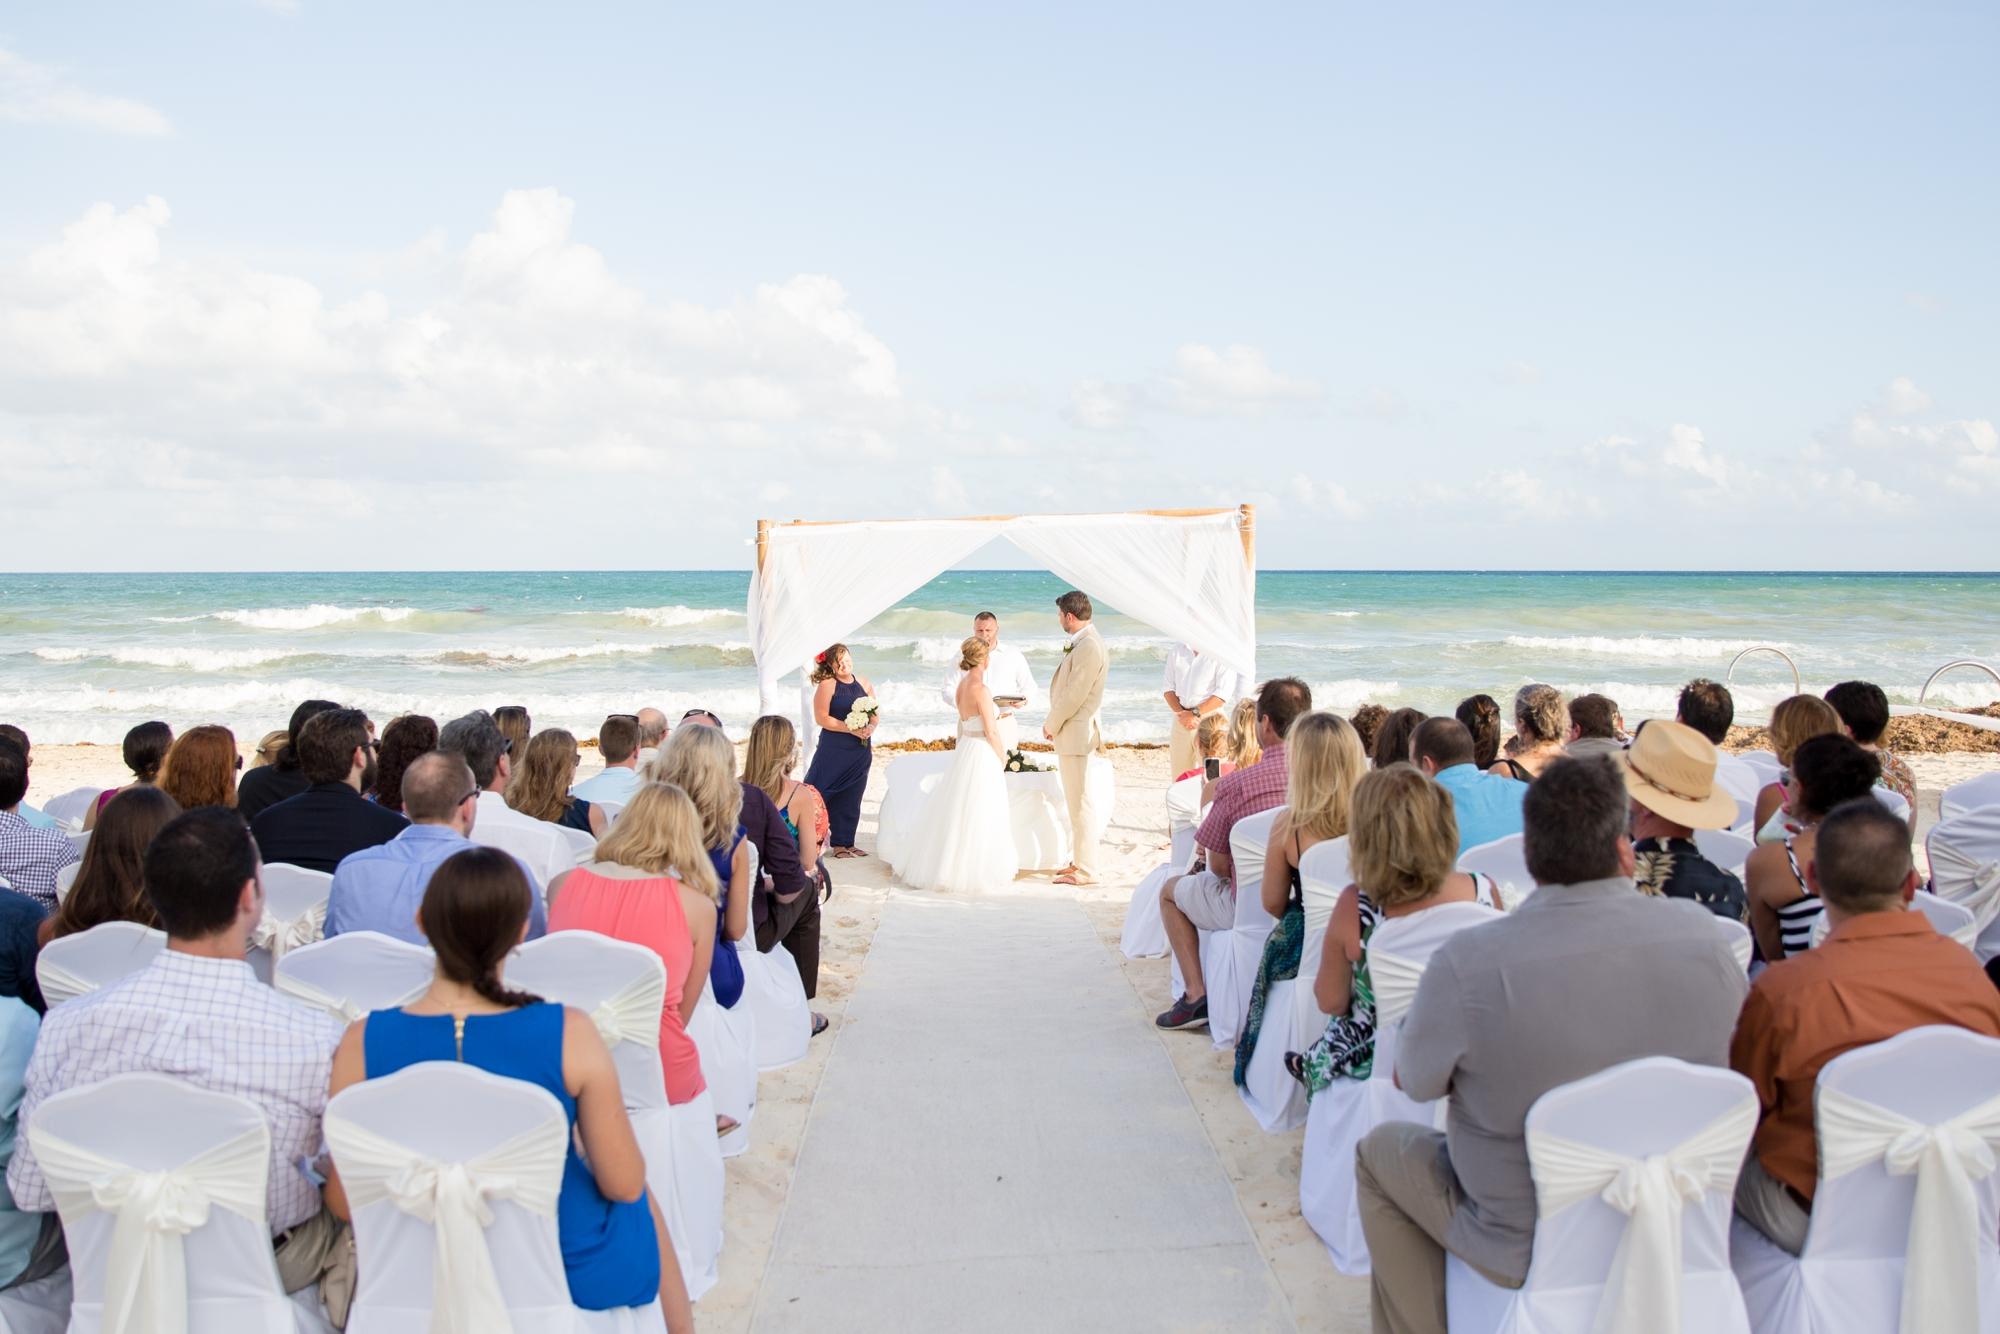 Morosoff Wedding 2-Ceremony-202_anna grace photography destination wedding photographer playa del carmen mexico photo.jpg